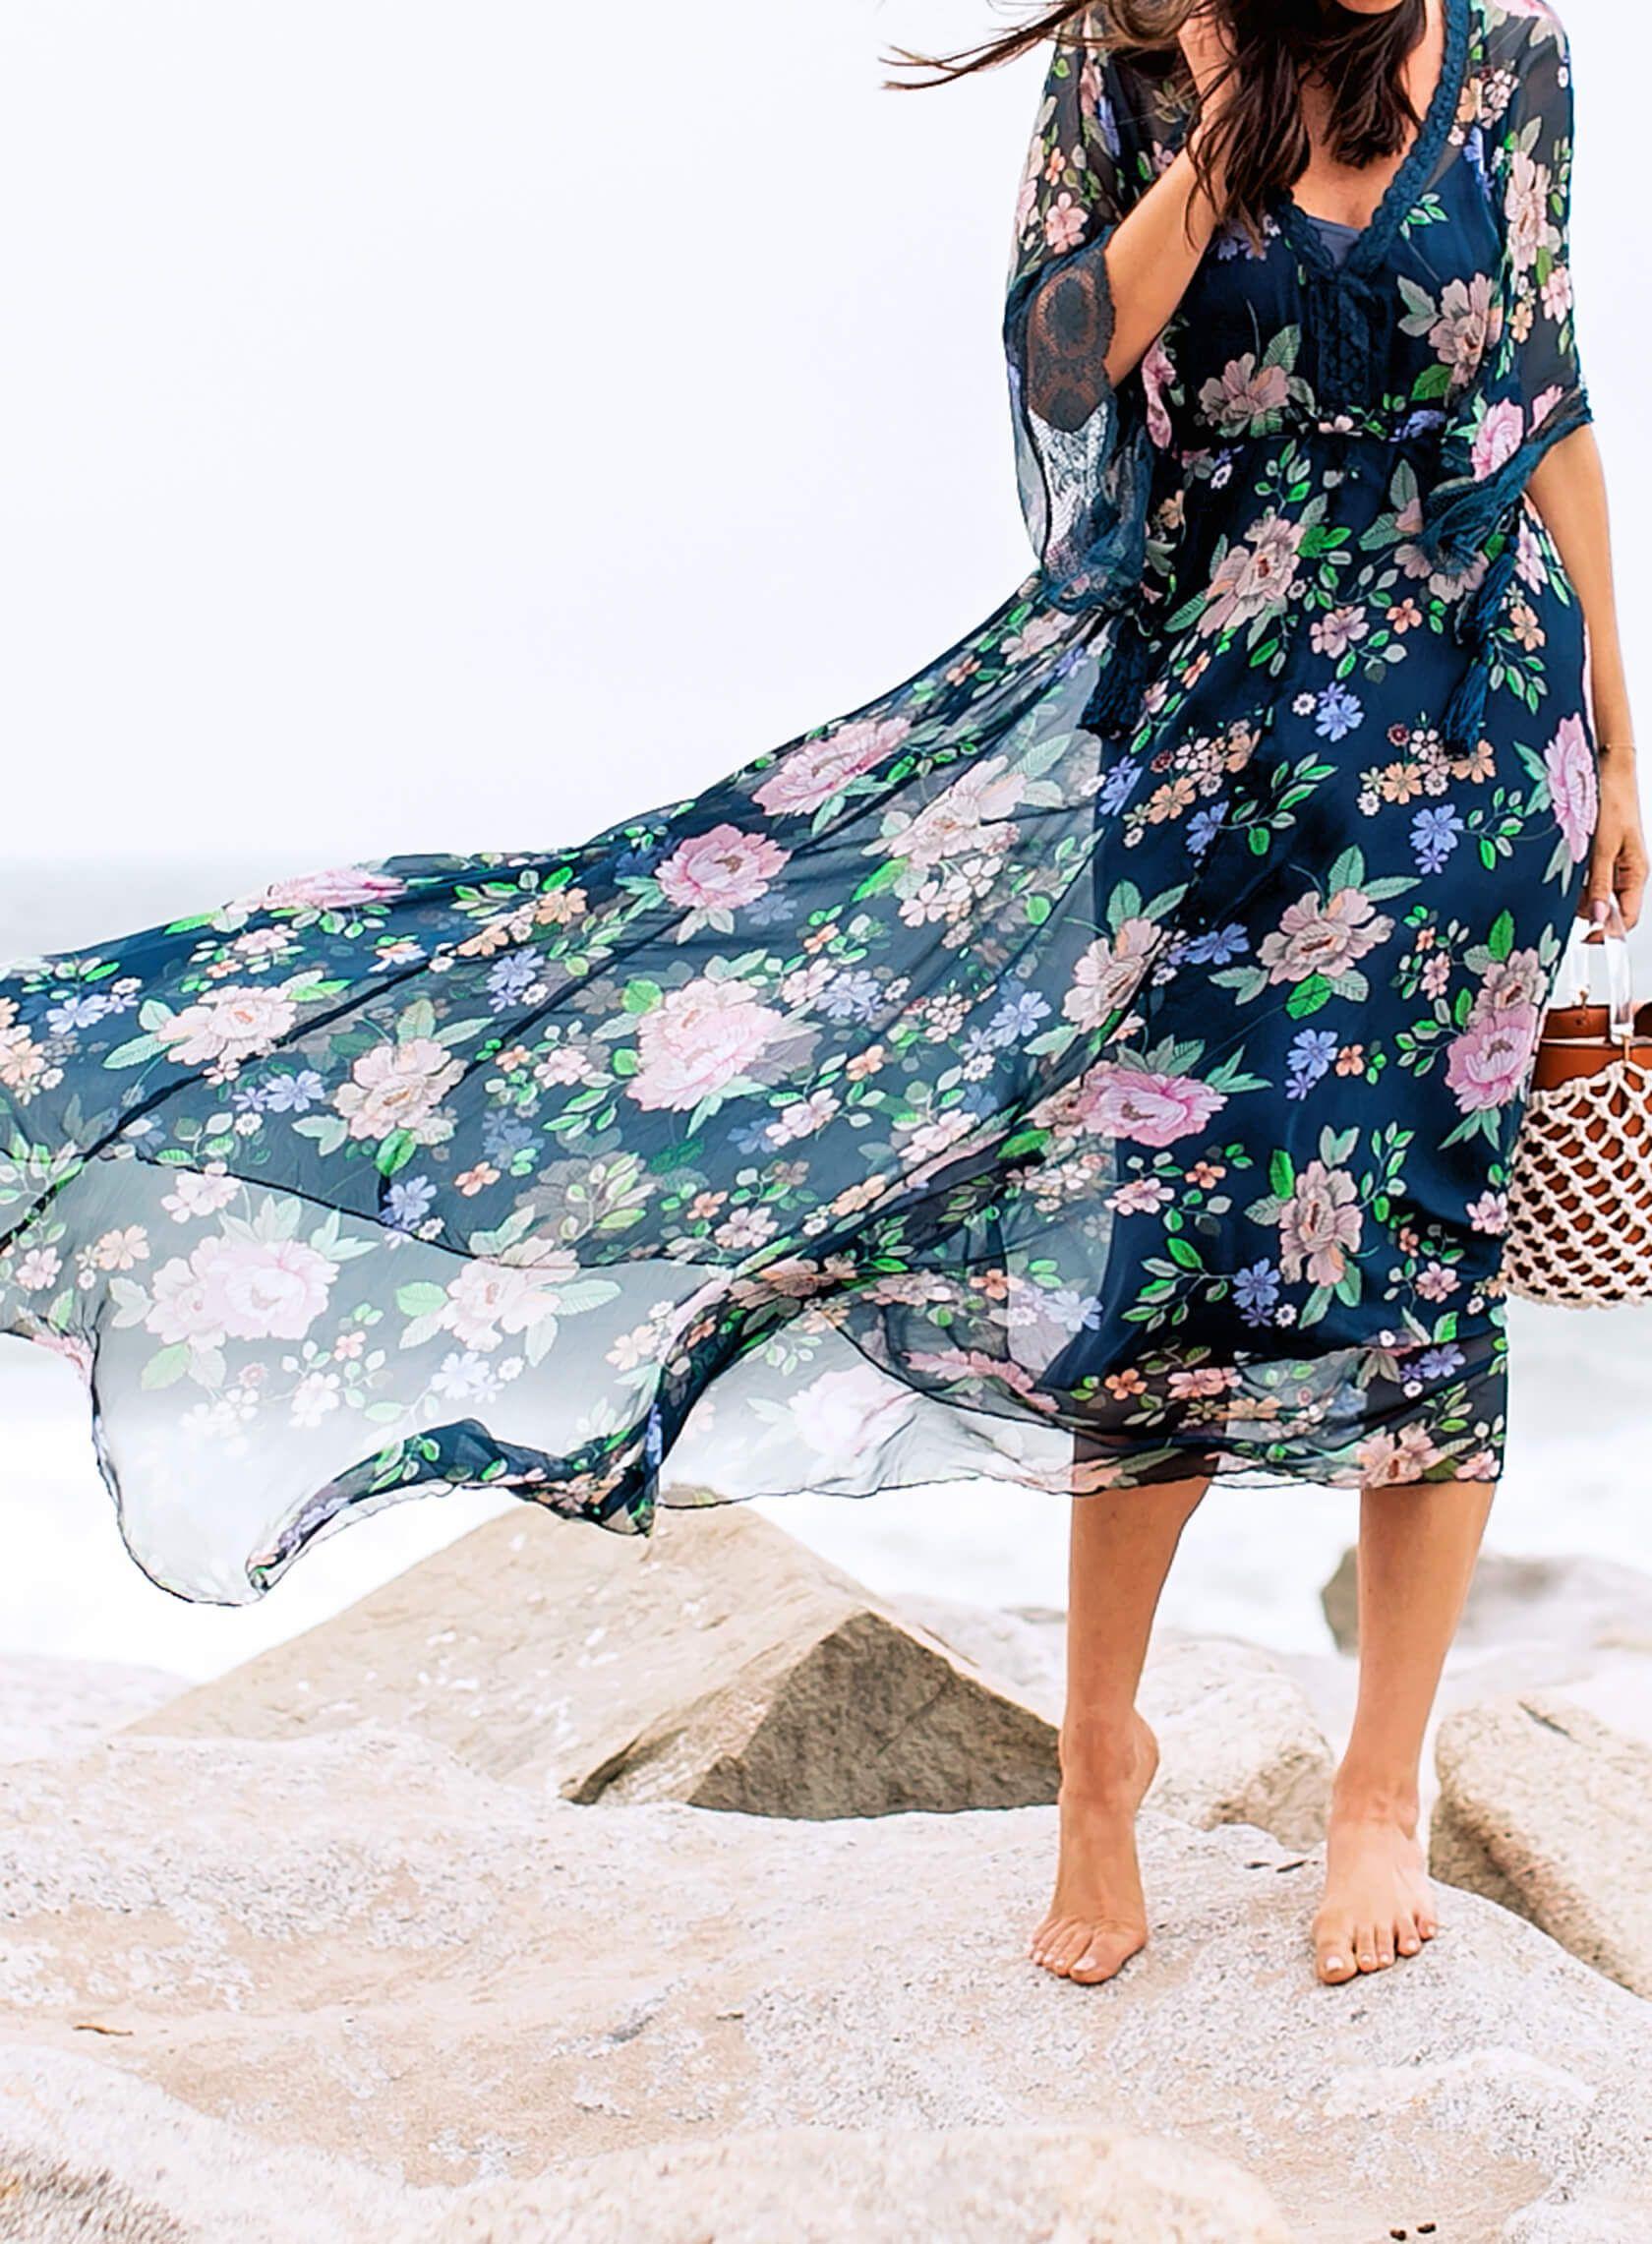 Windblown Boho Look In a Floral Maxi Dress  Sydne Style  Boho